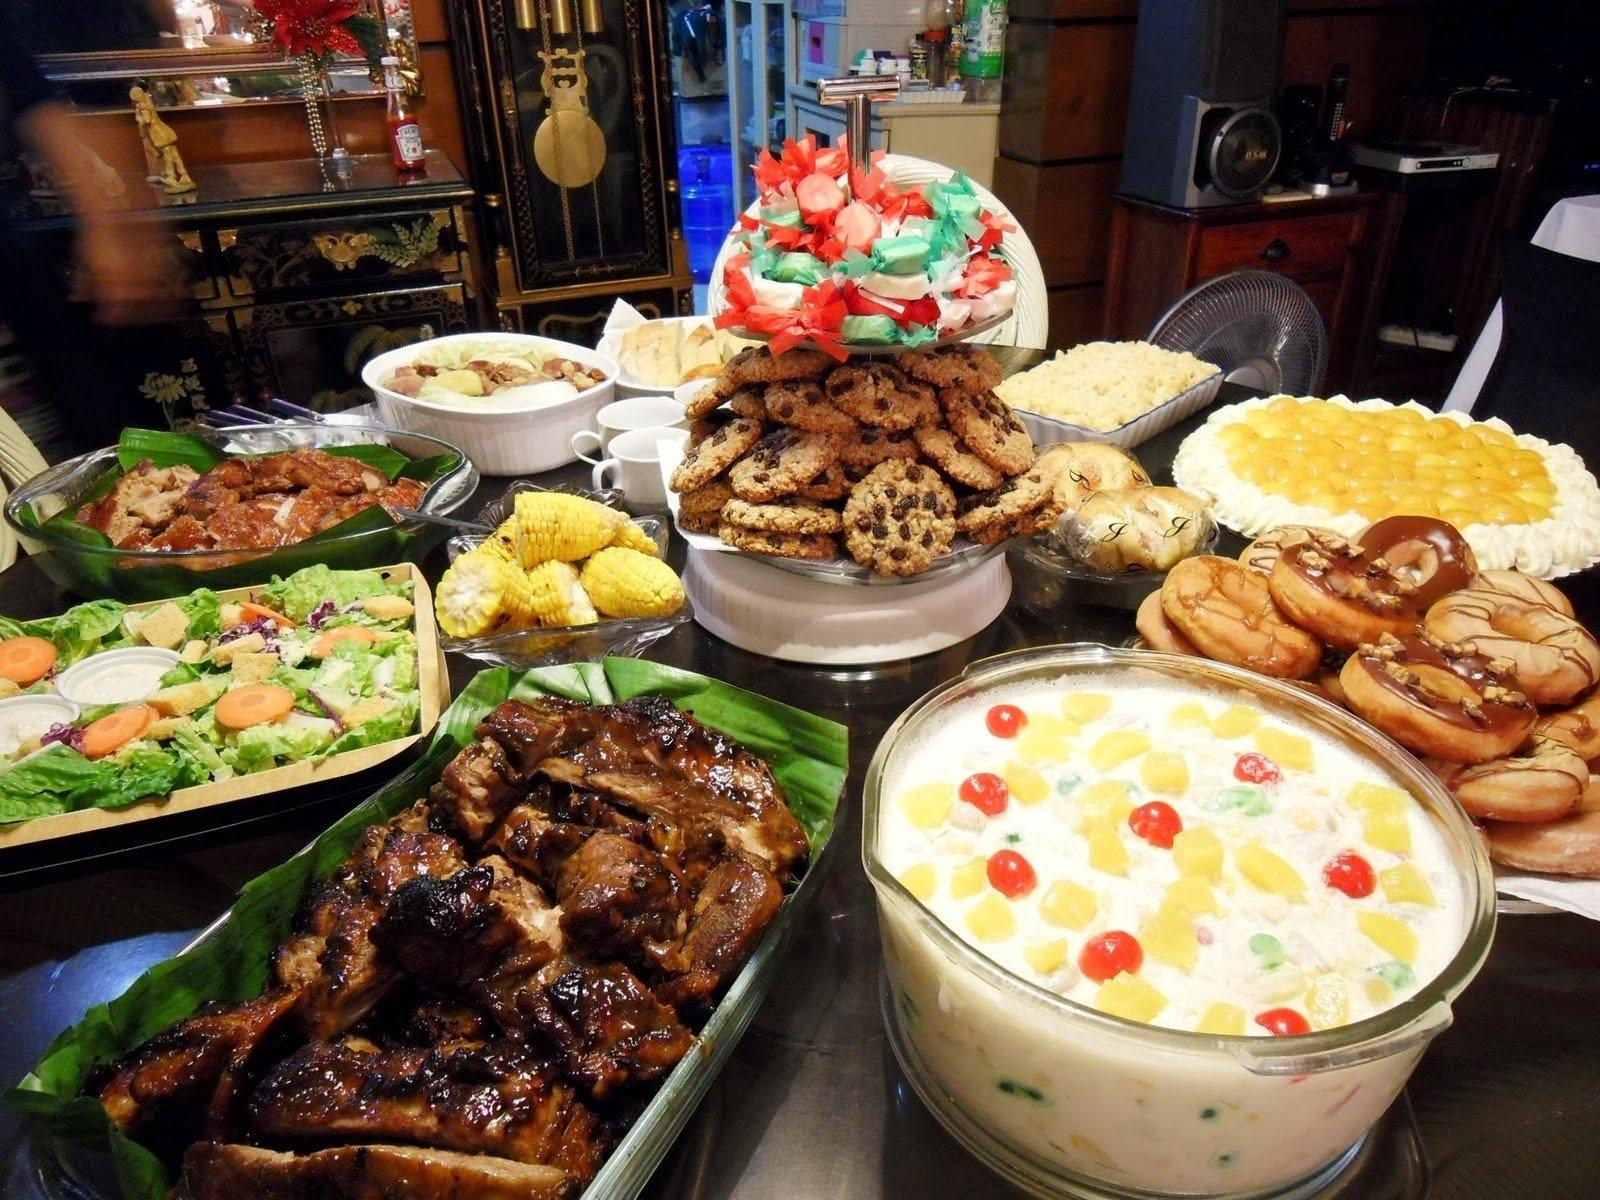 10 Beautiful New Years Eve Menu Ideas filipino media noche recipes on new years eve barako newsline 2 2020